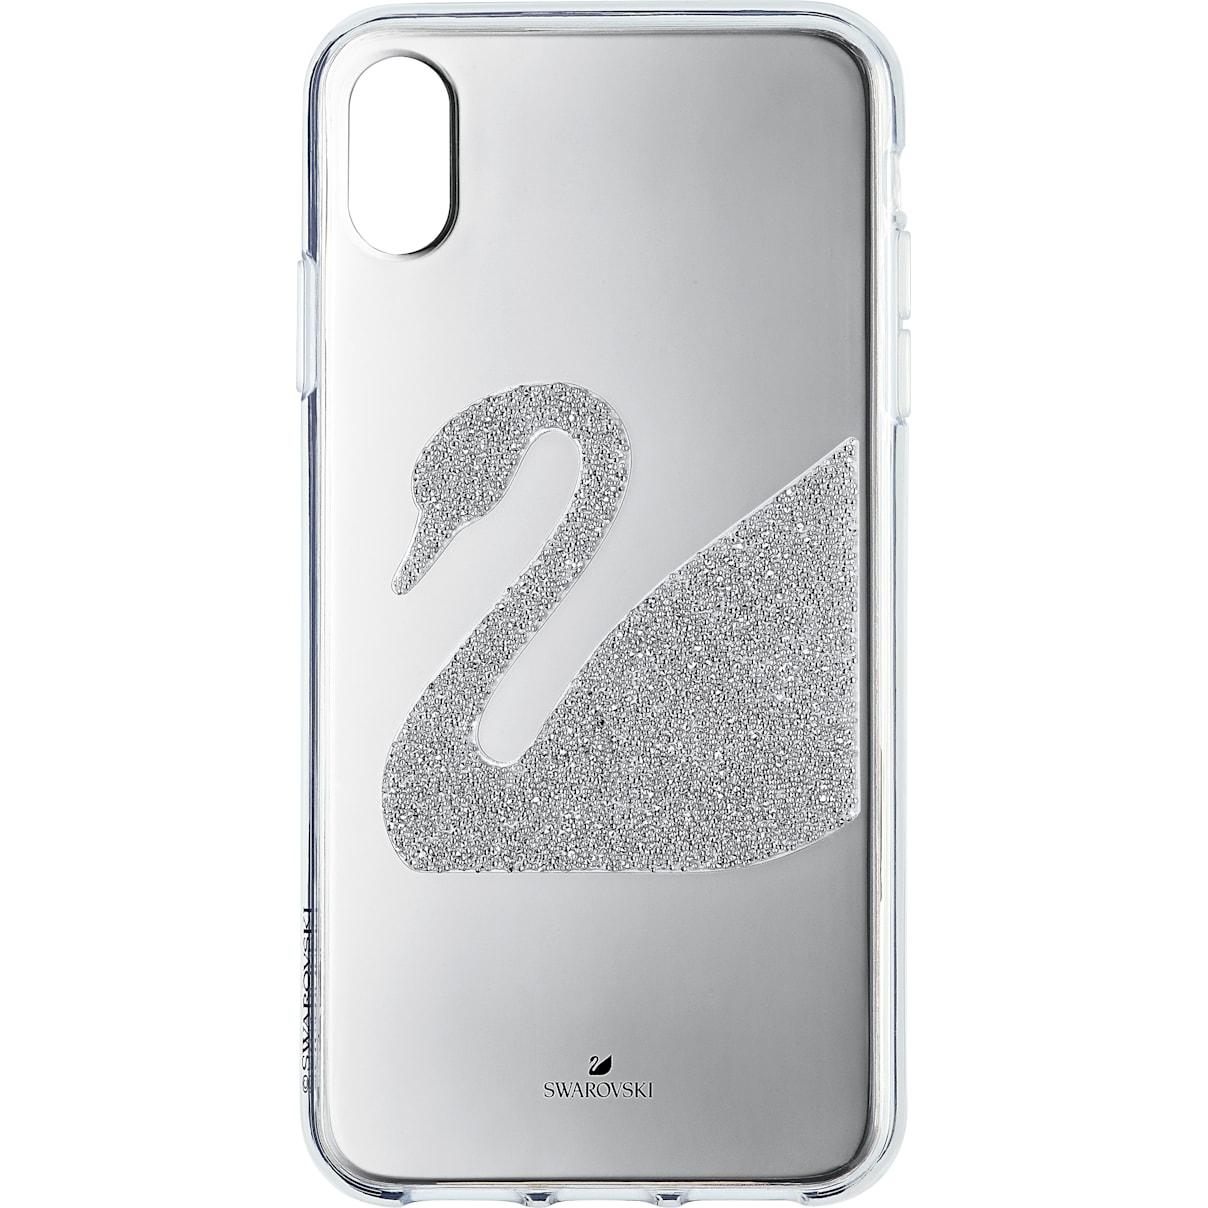 Swarovski Swan Smartphone Case, iPhone® XR, Gray